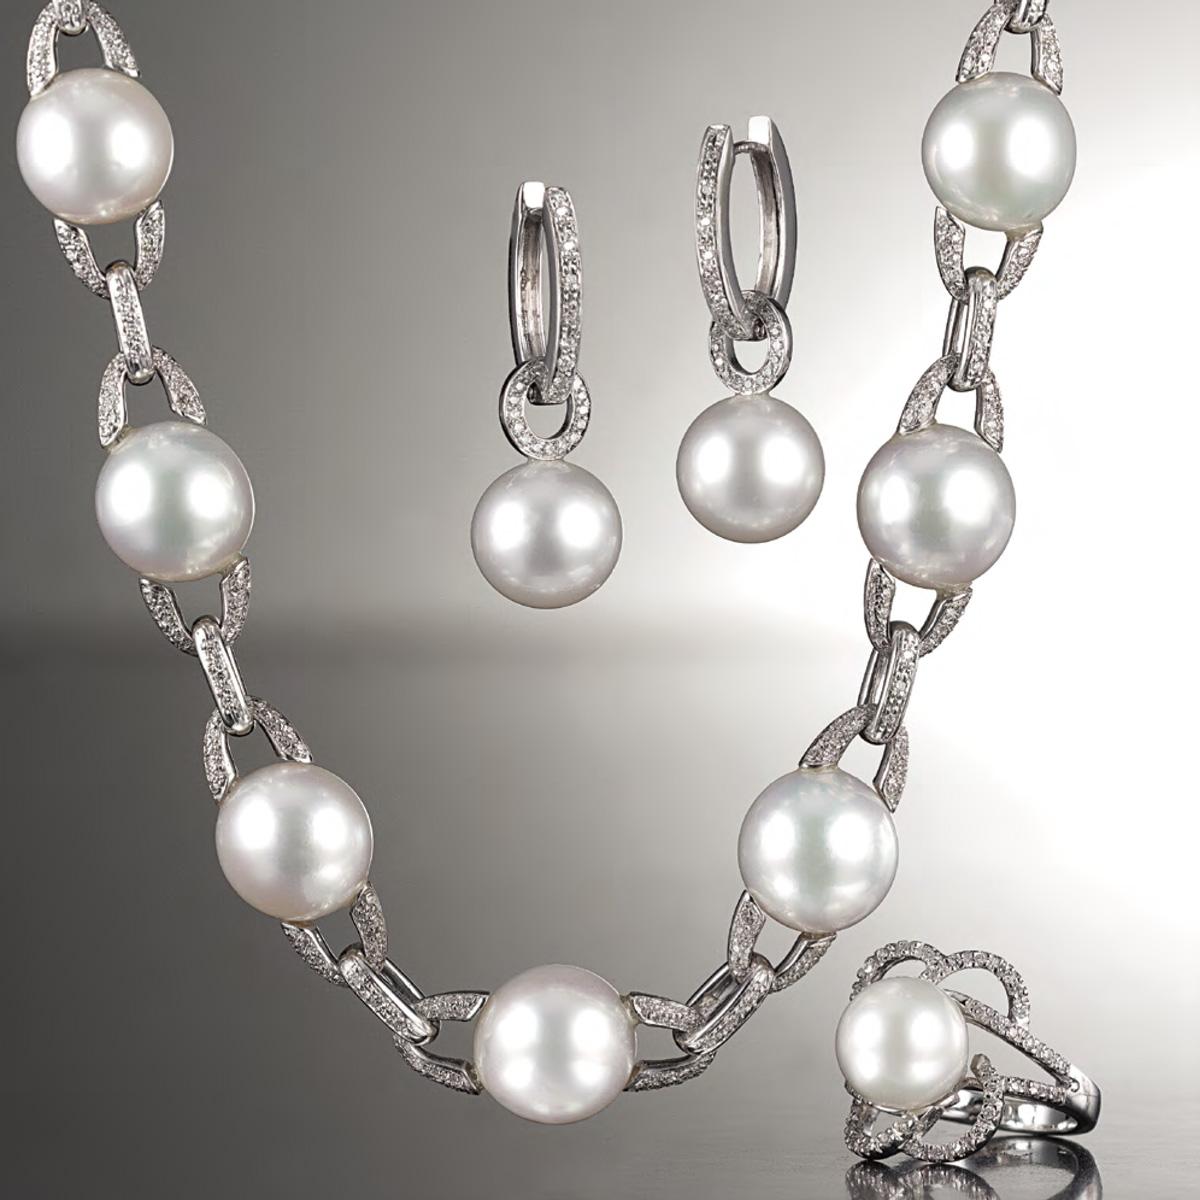 Parure in perle - Pearls parure